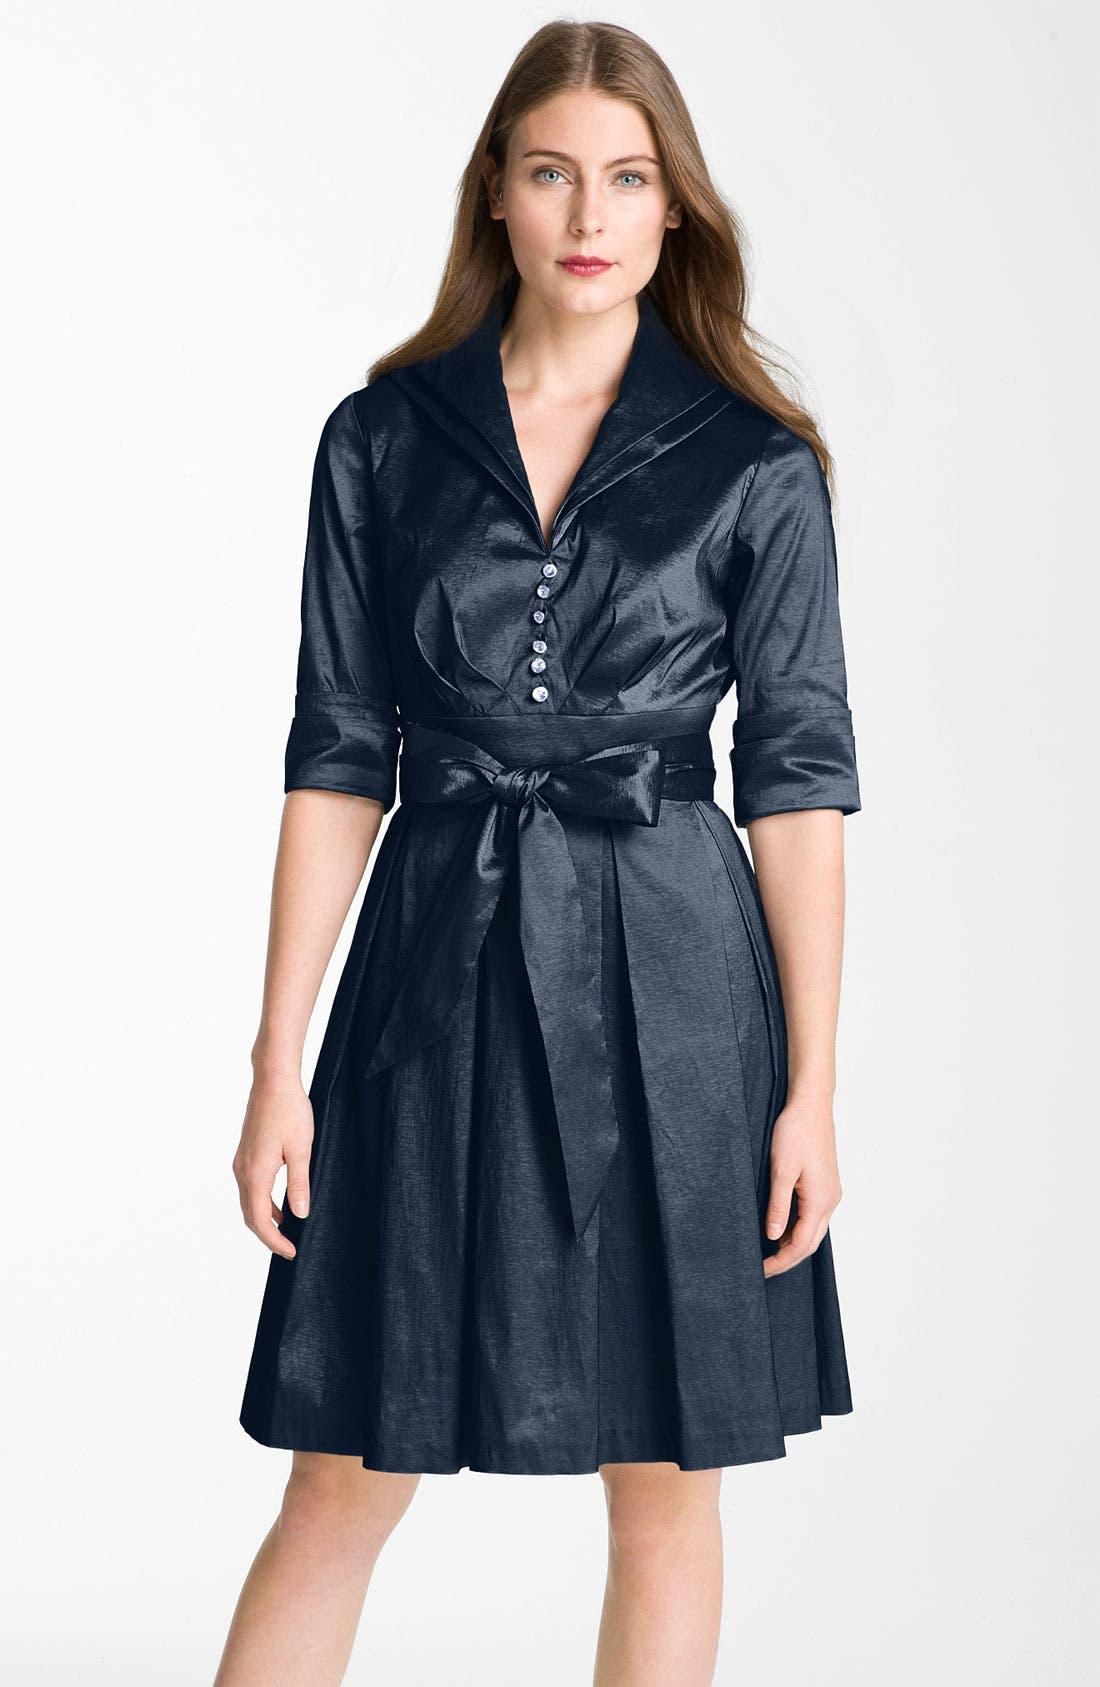 Alternate Image 1 Selected - Donna Ricco Metallic Fit & Flare Taffeta Shirtdress (Regular & Petite)